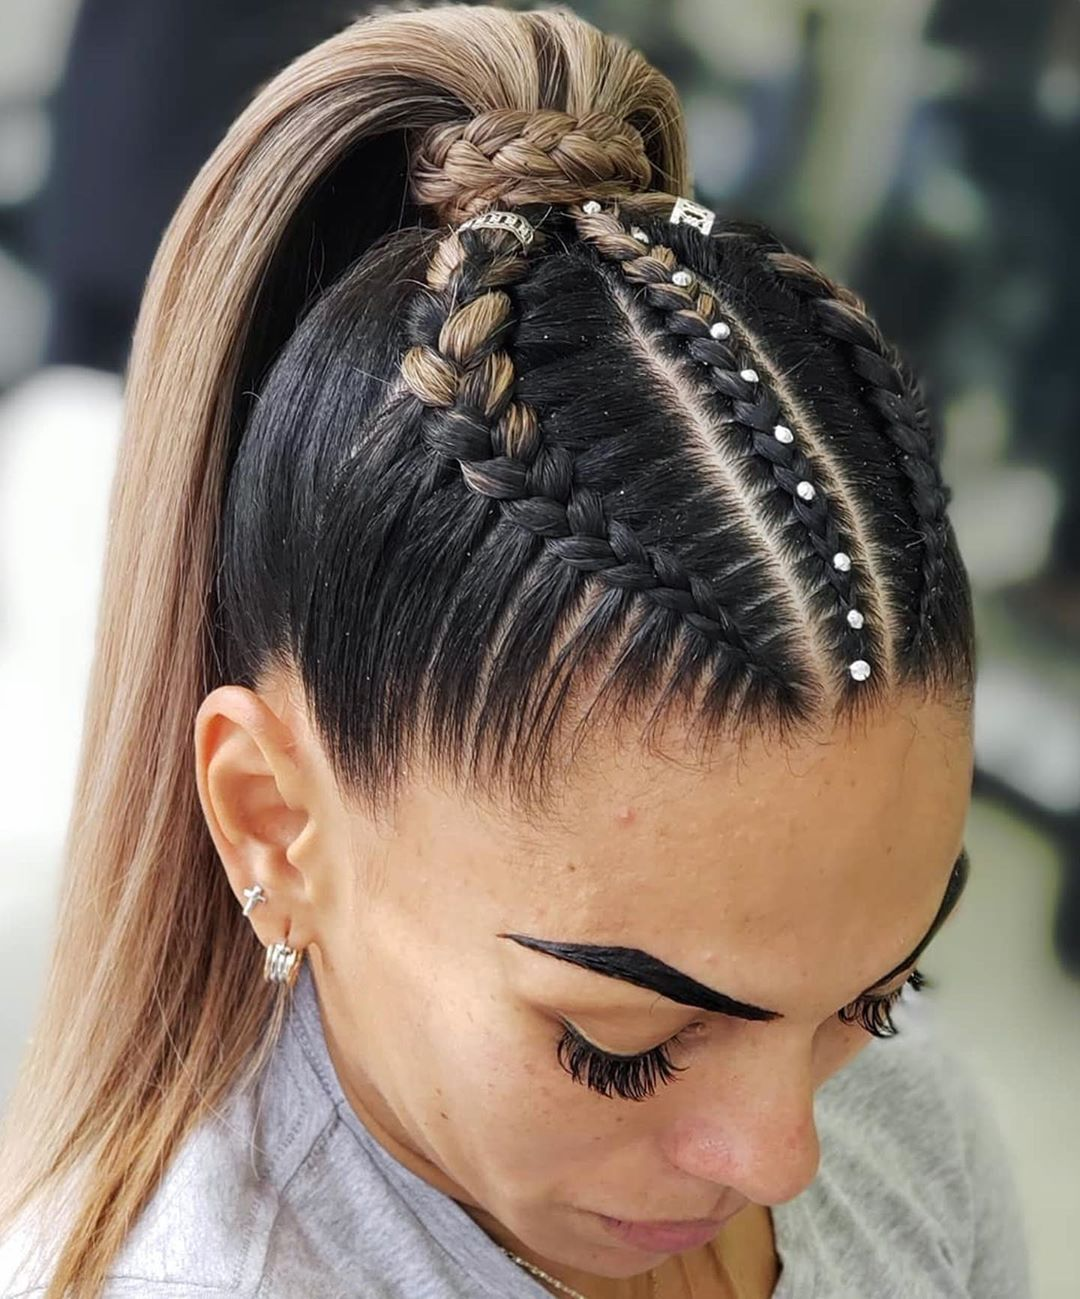 14 Peinados recogidos con trenzas